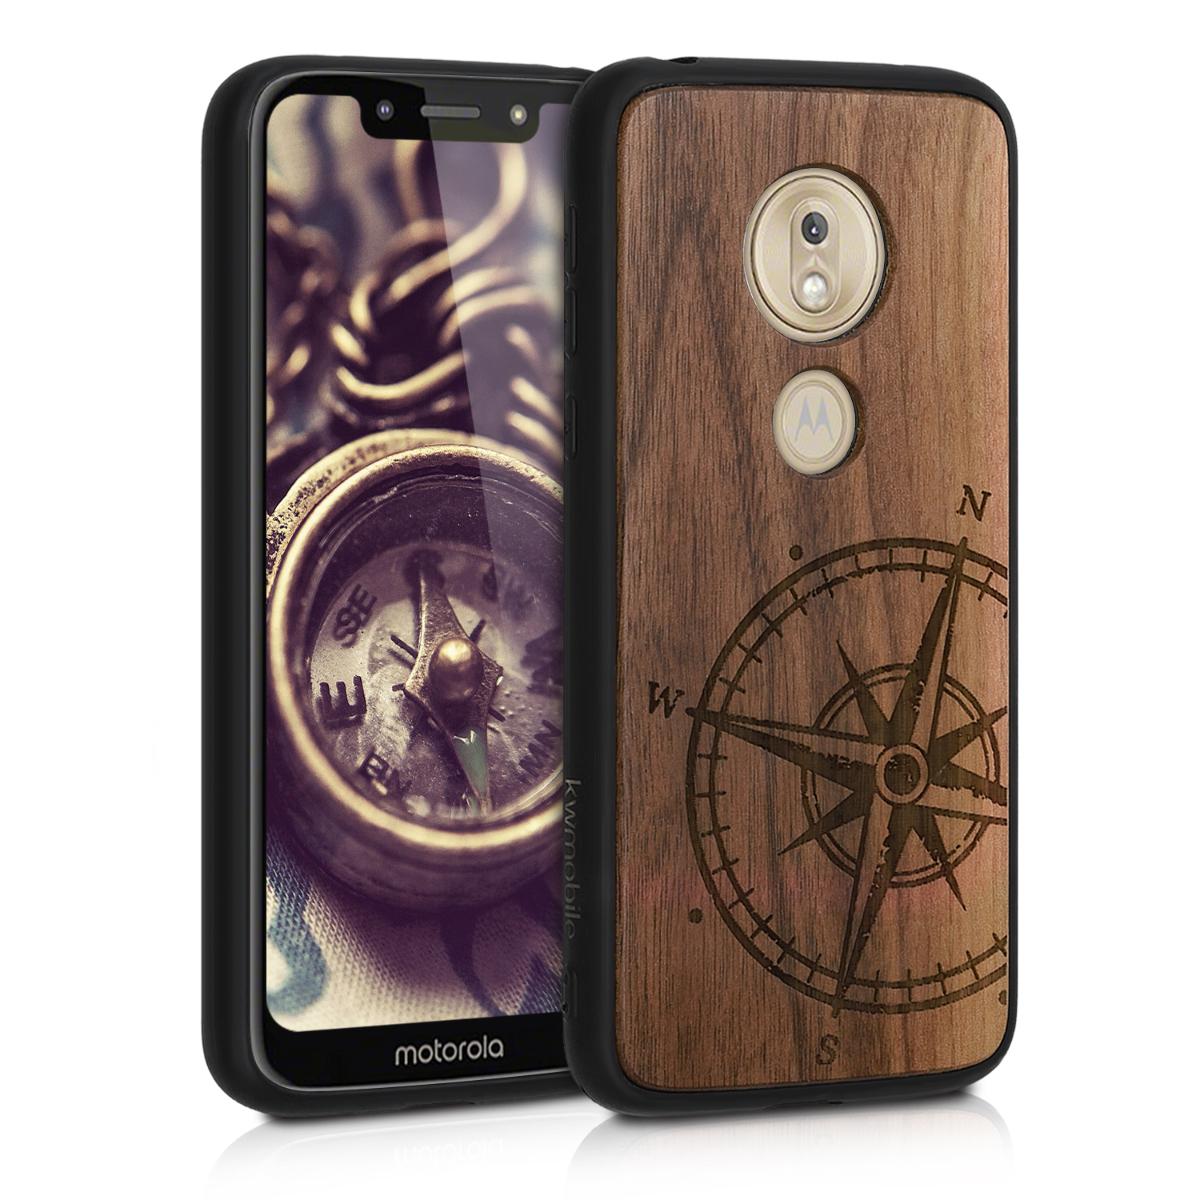 KW Σκληρή Ξύλινη Θήκη με TPU Bumper Motorola Moto G7 Play - Navigational Compass (50324.02)